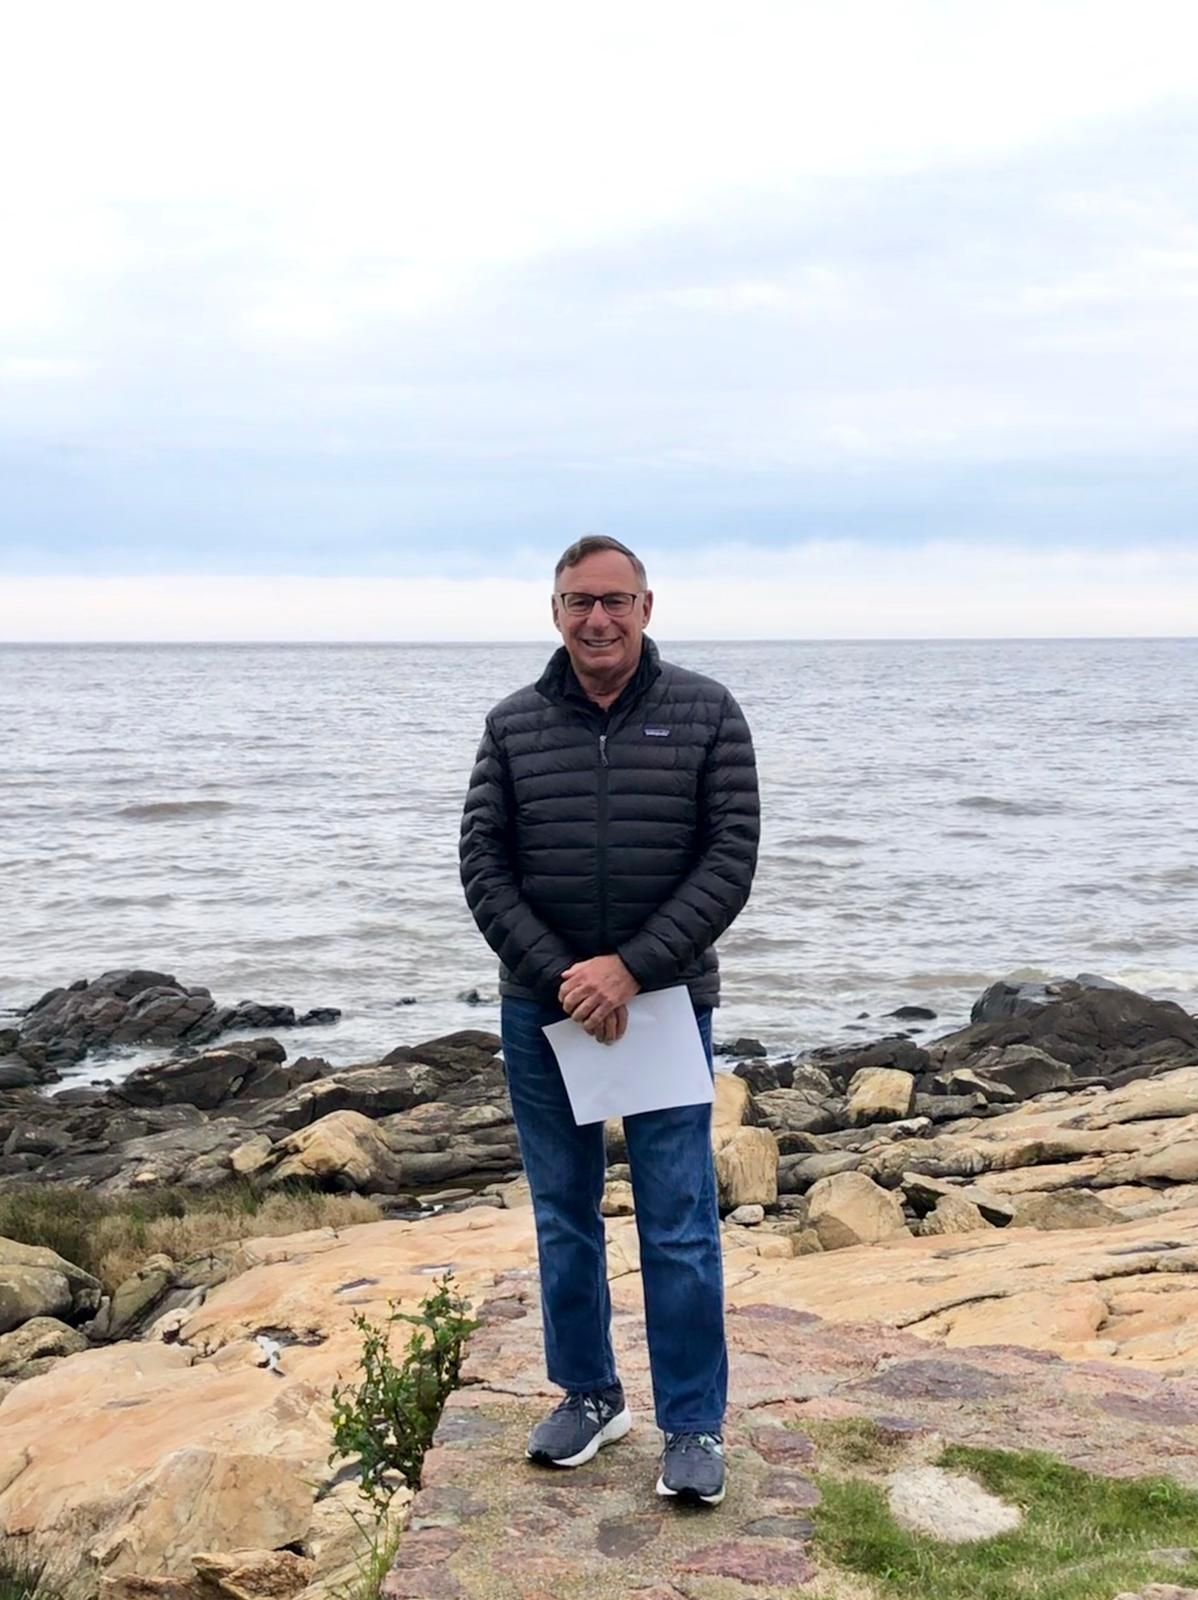 Richard Levine by the Sea